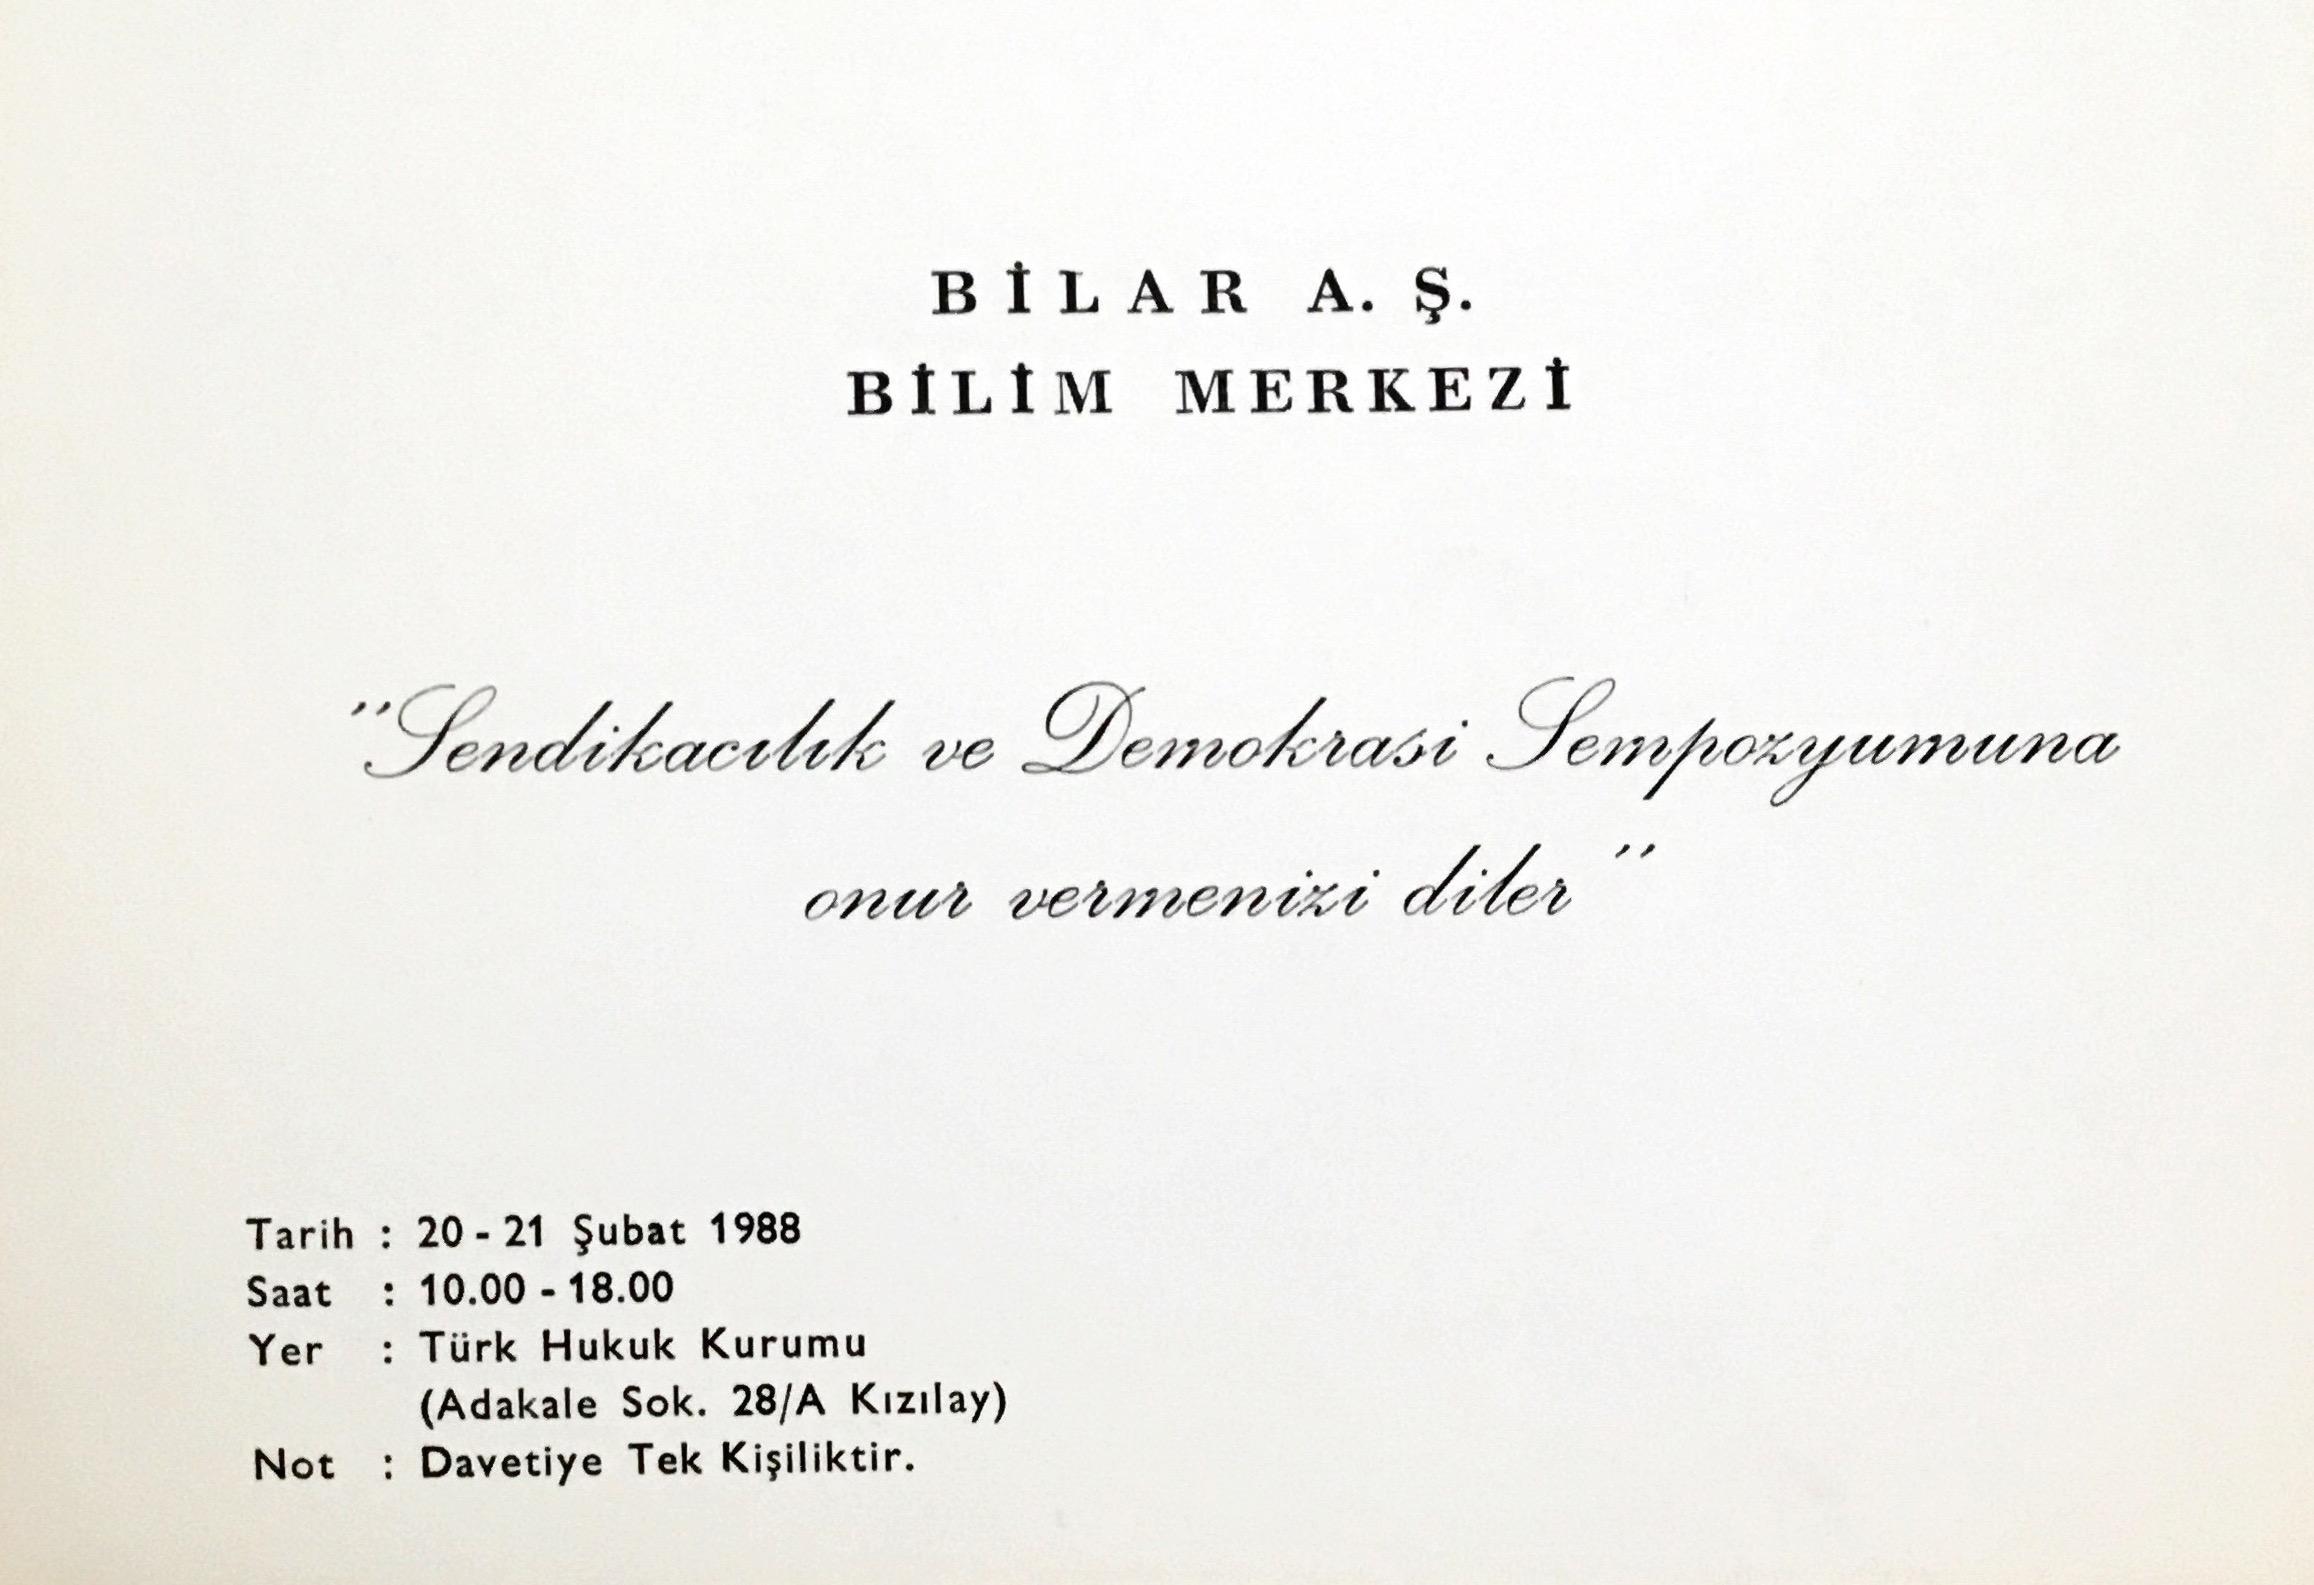 1988-Subat_davetiye_sendikacilik-demokrasi-sempozyumu.JPG